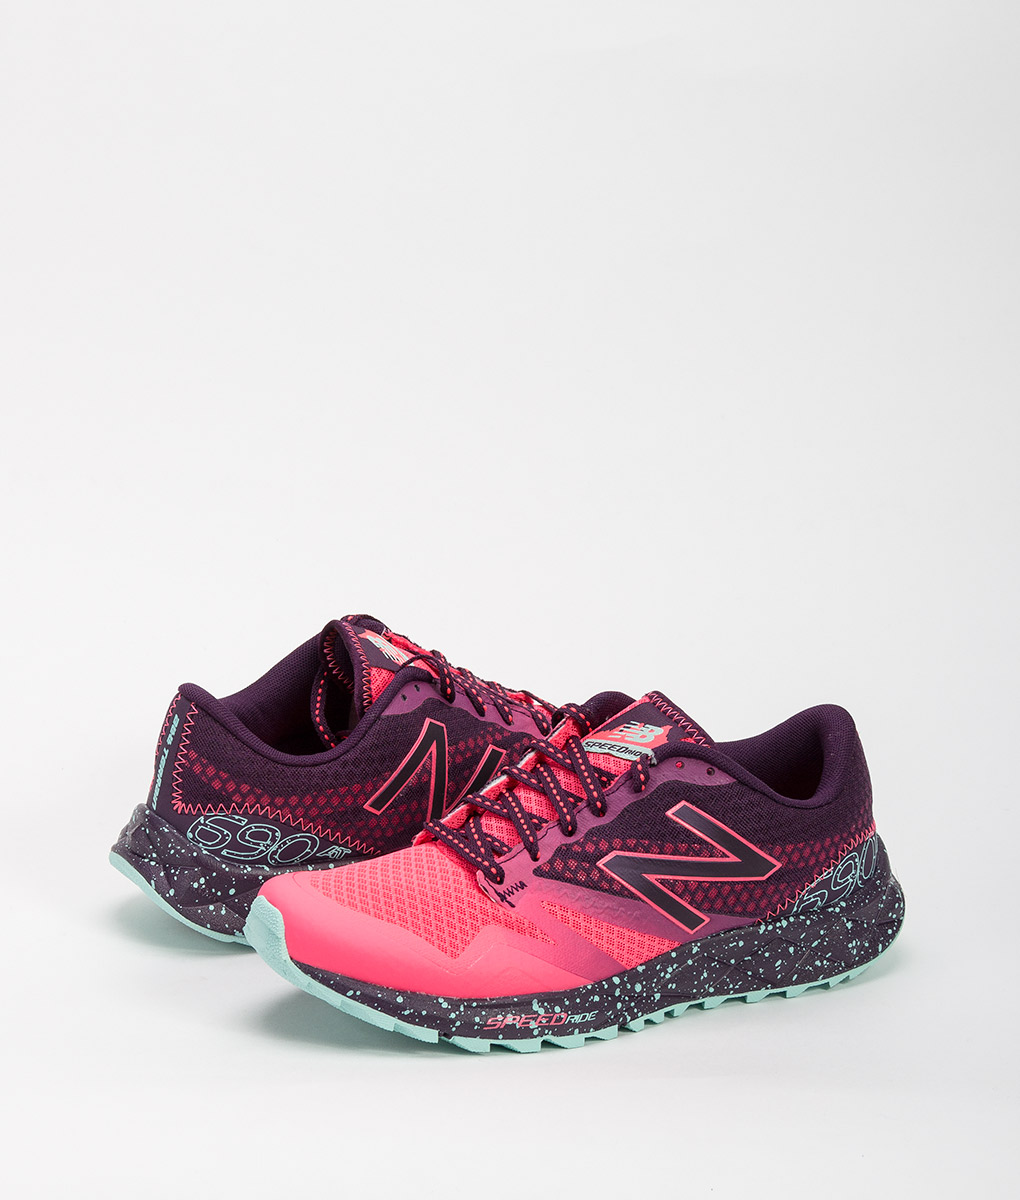 BALANCE Women Running Shoes WT690 79.99